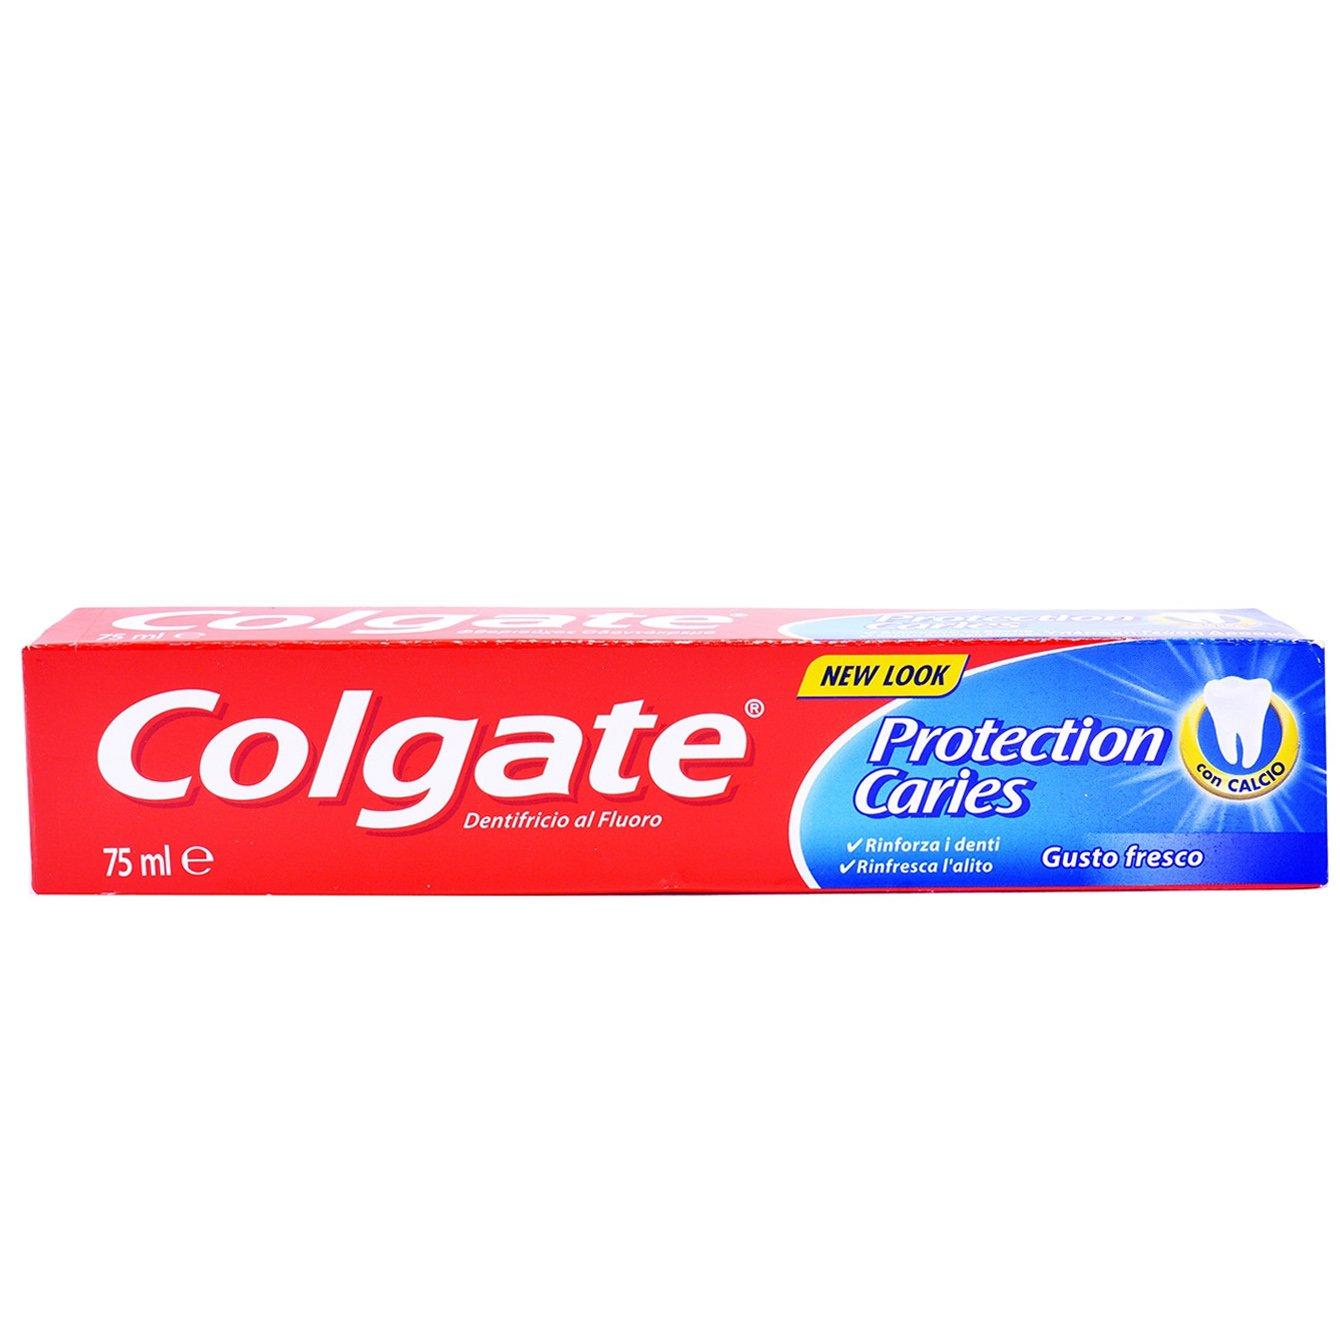 Colgate Protection Caries Οδοντόκρεμα με Ενεργό Φθόριο & Ασβέστιο για Κορυφαία Προστασία Από την Τερηδόνα 75ml